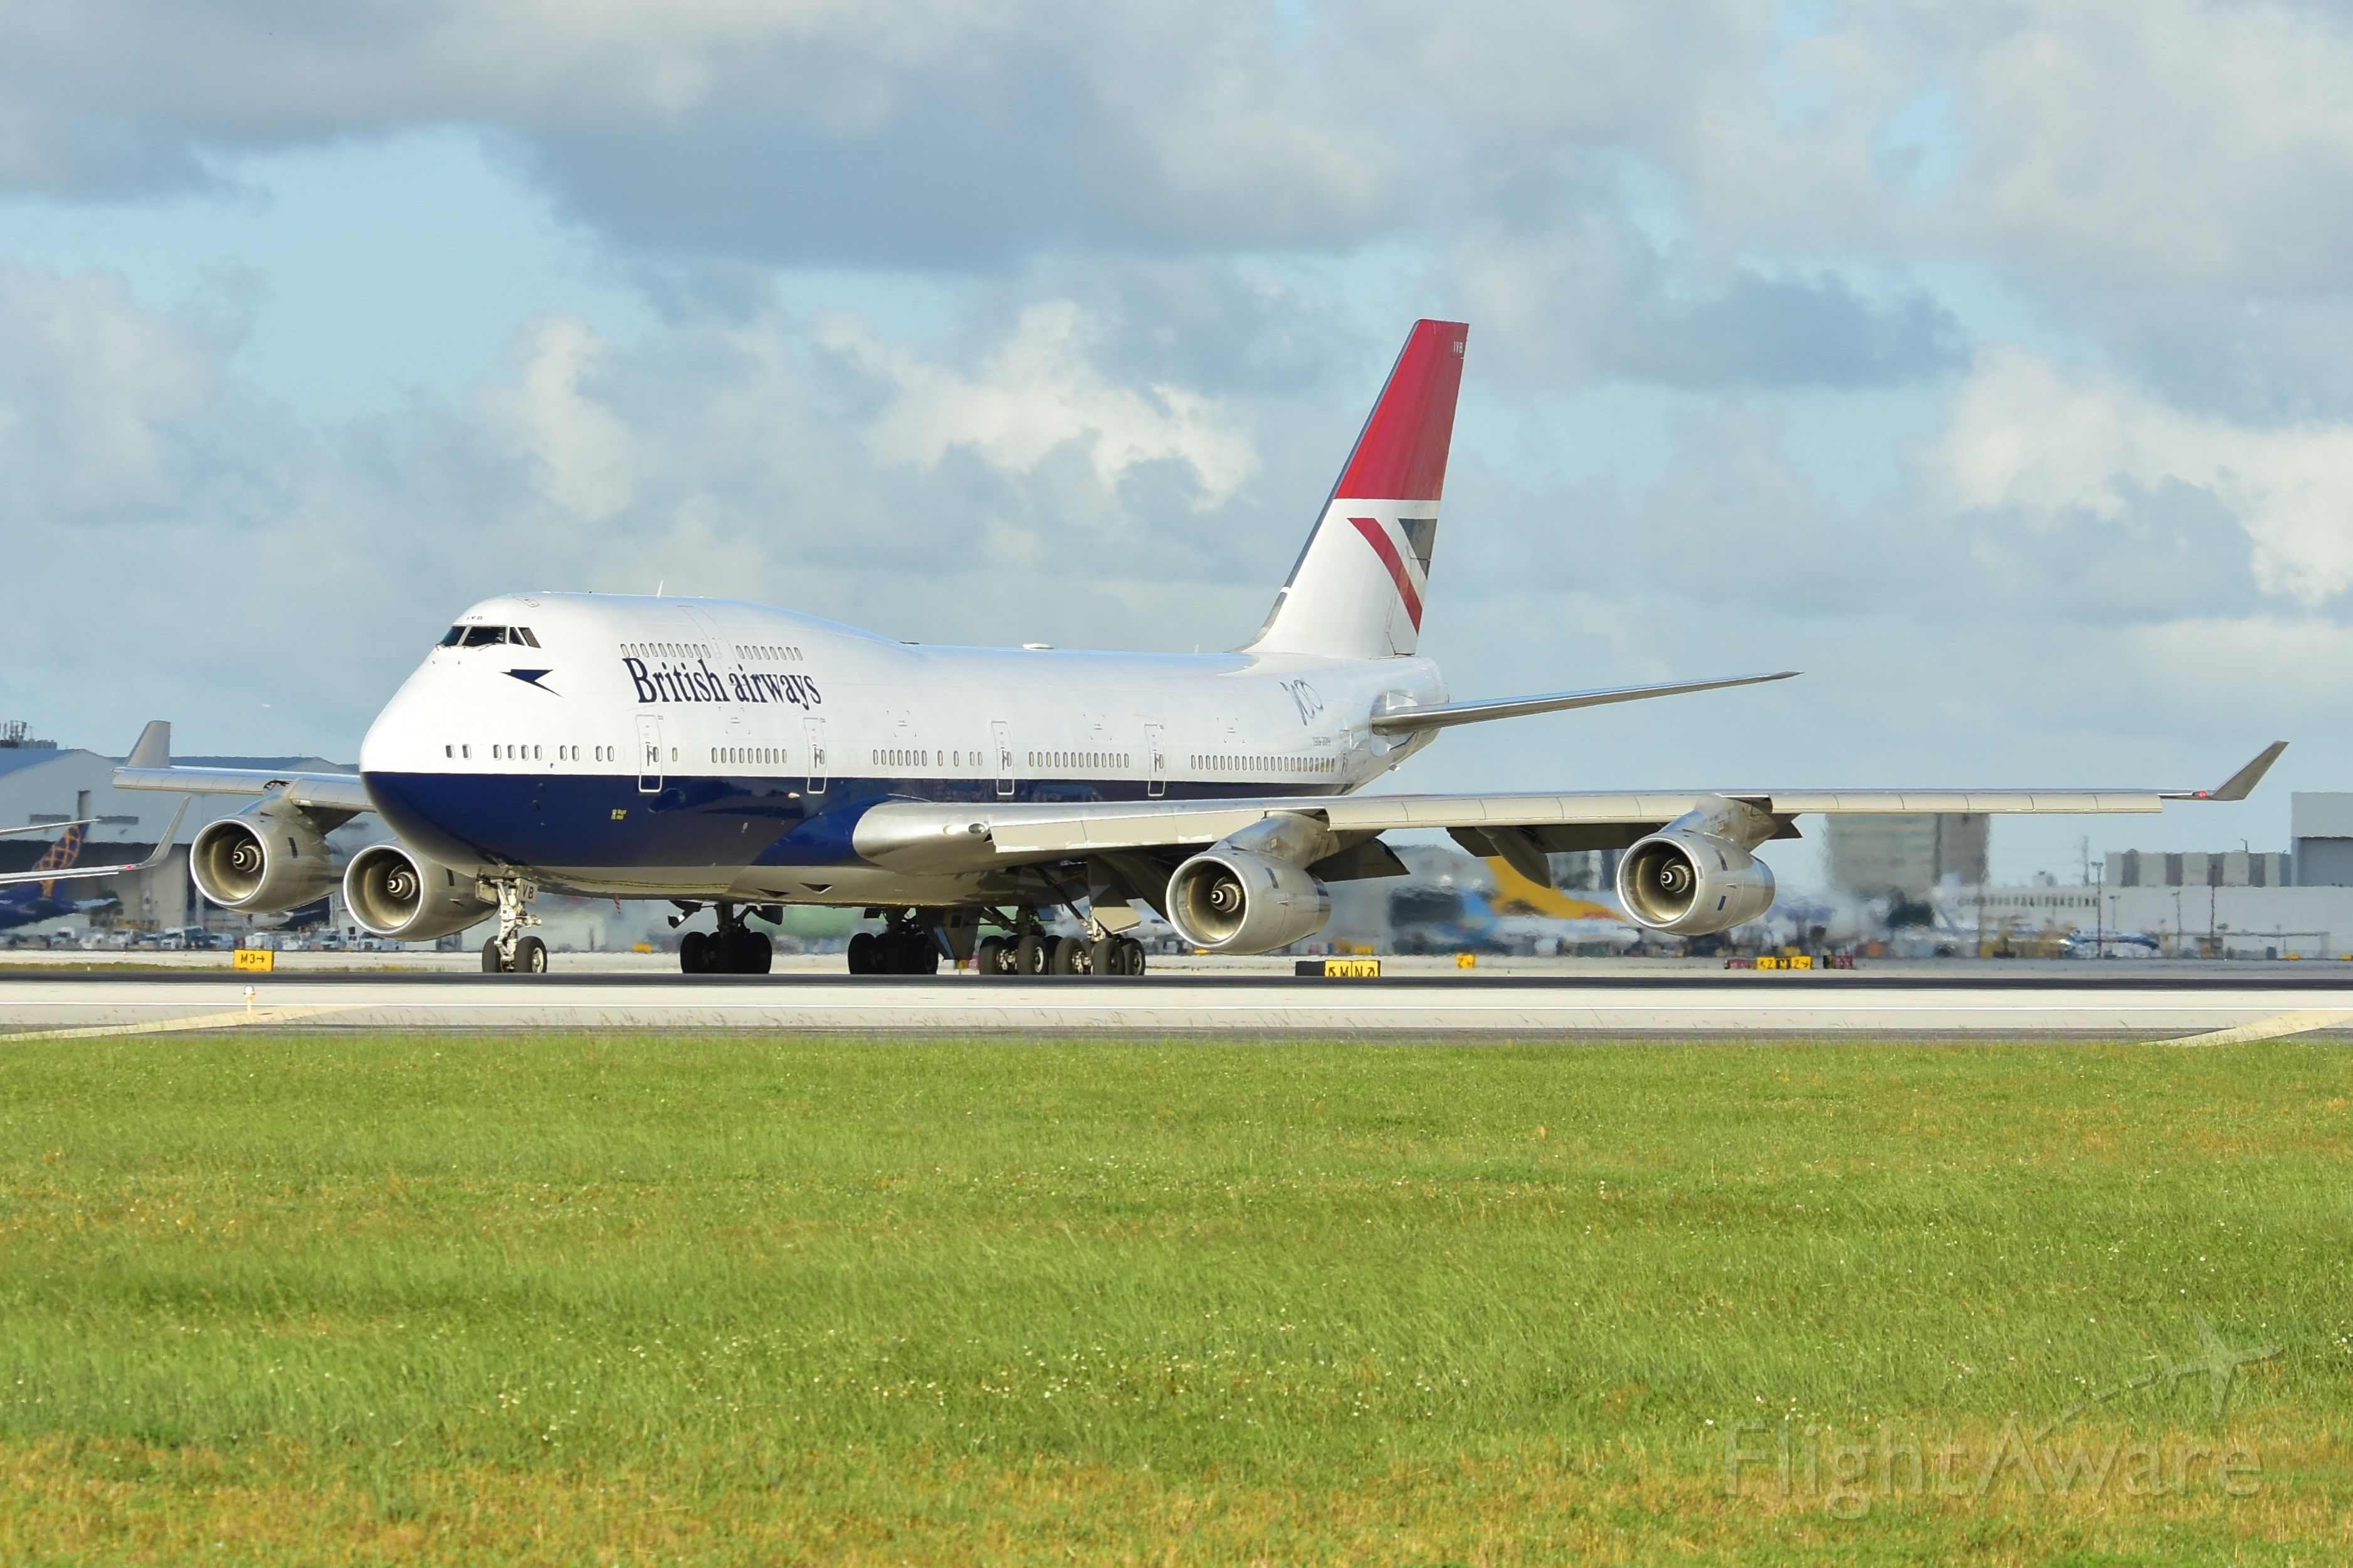 Boeing 747-200 (G-CIVB)